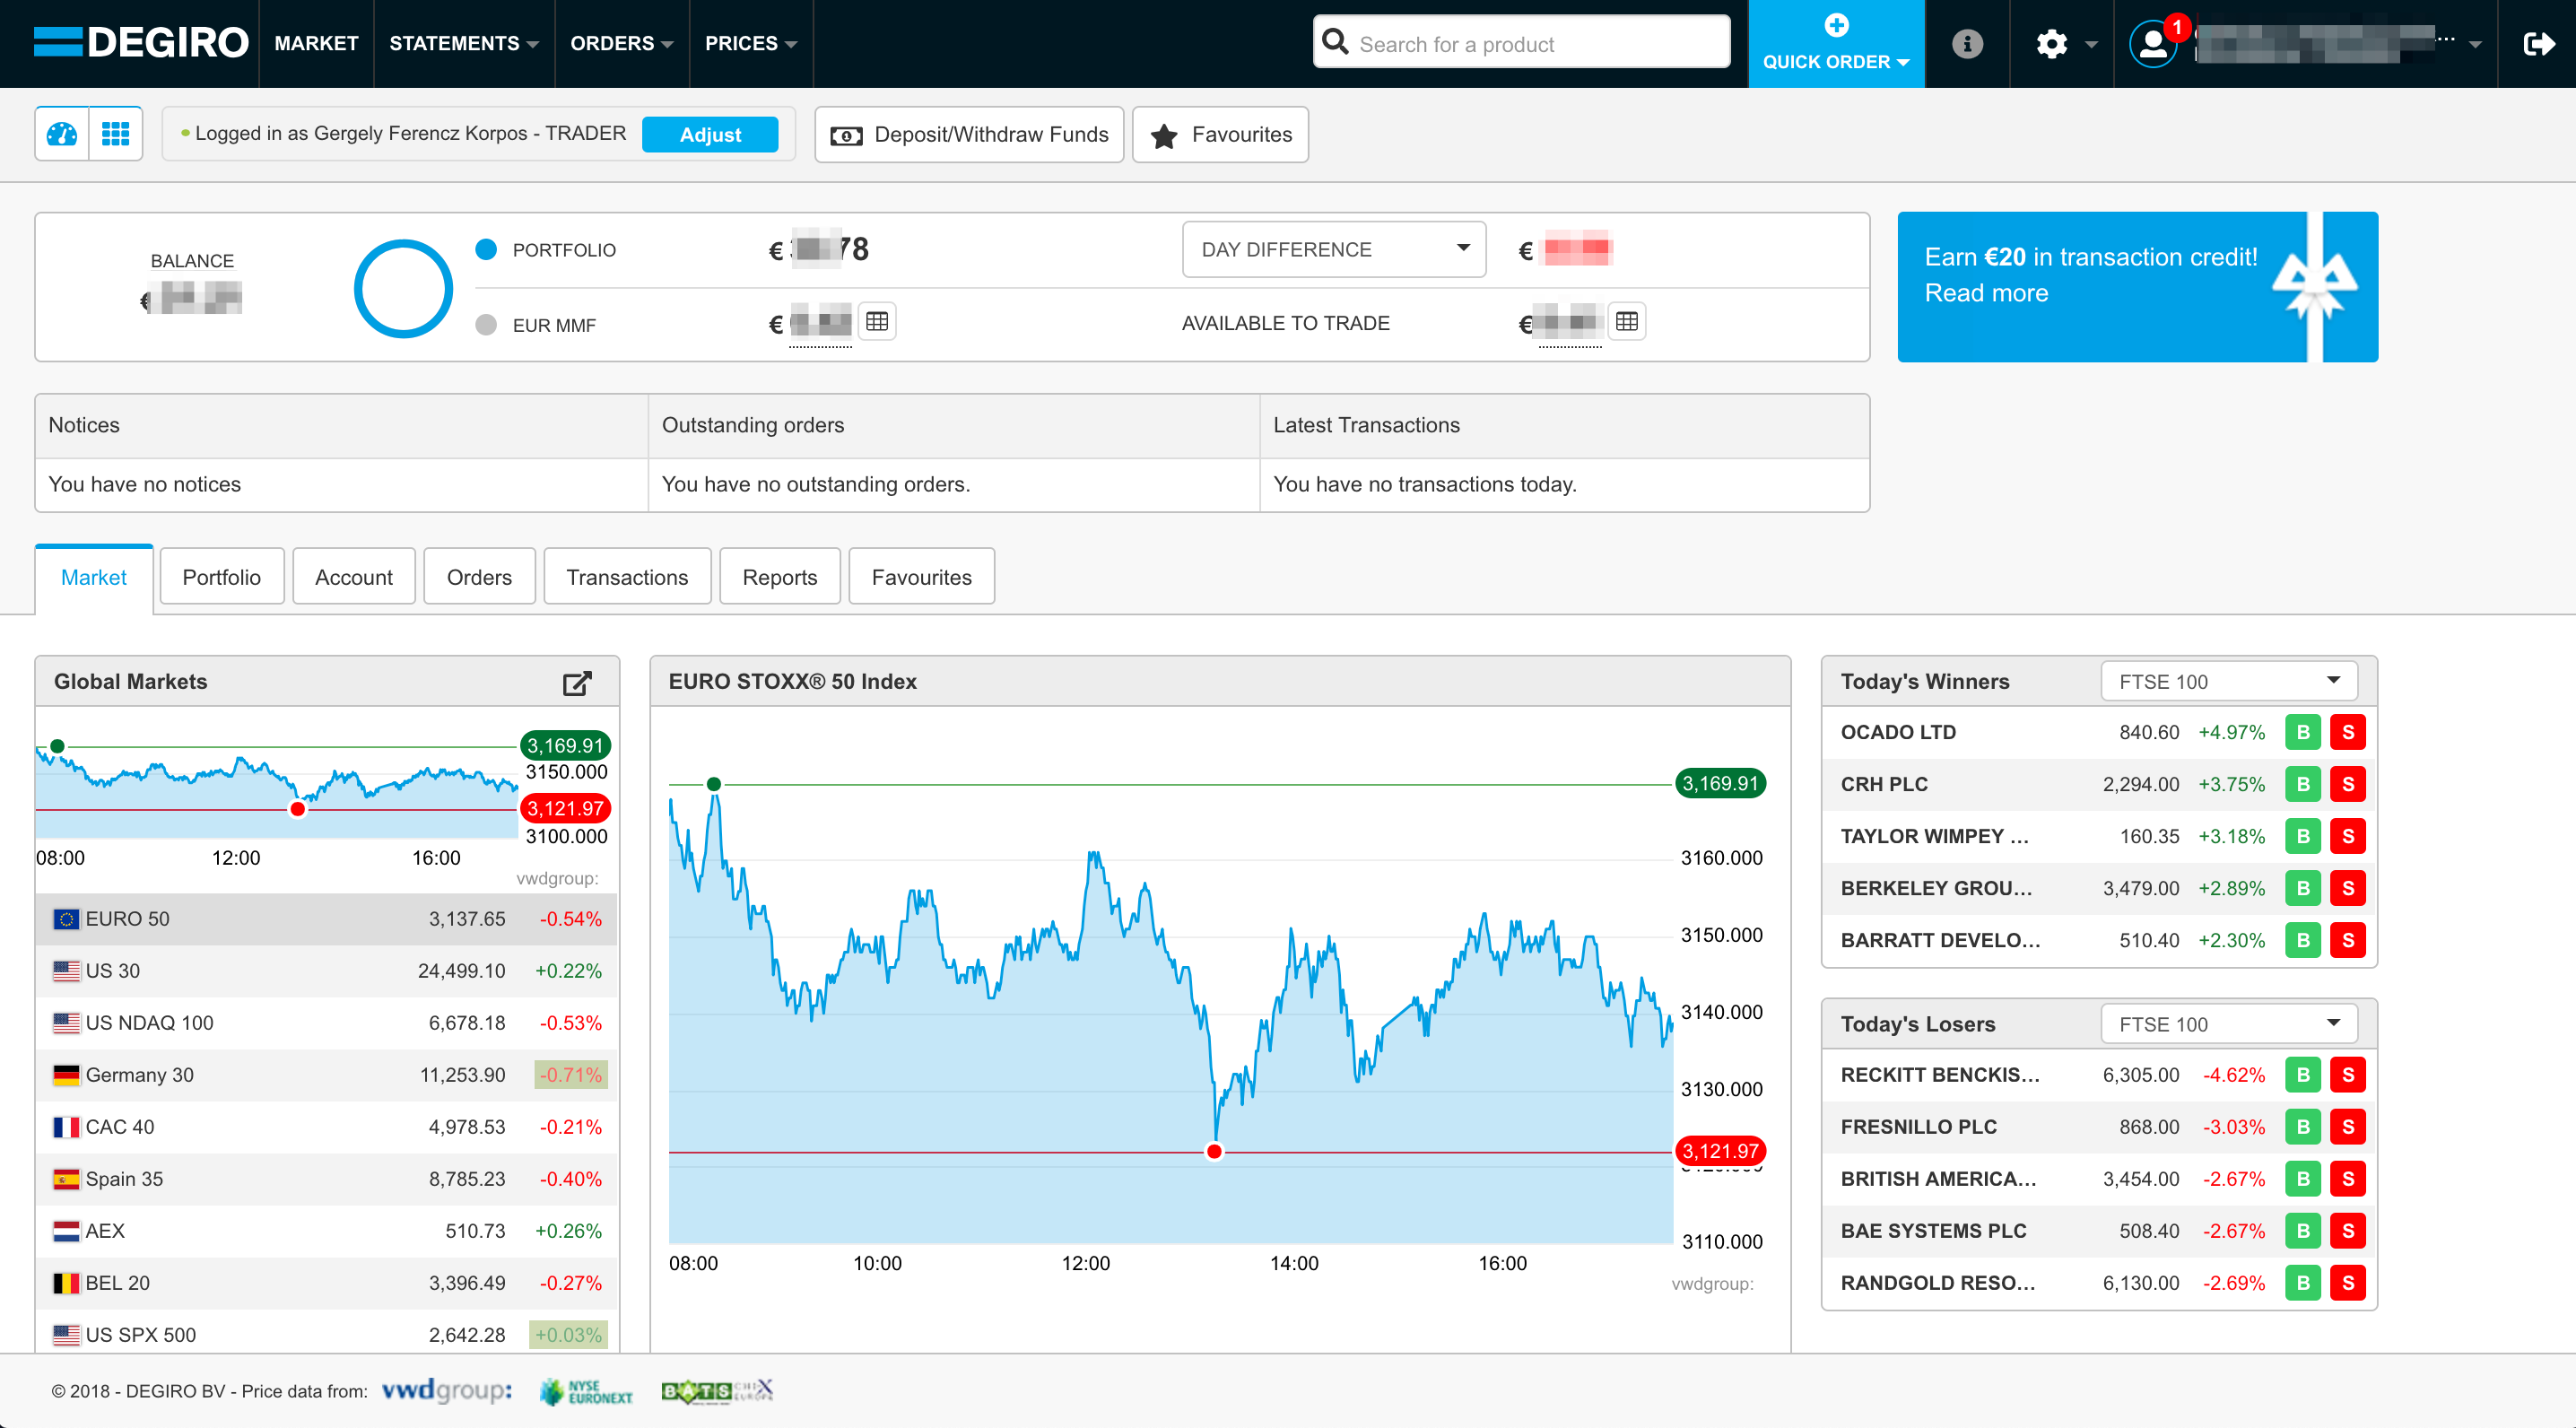 How to buy bitcoin - Degiro - Web trading platform